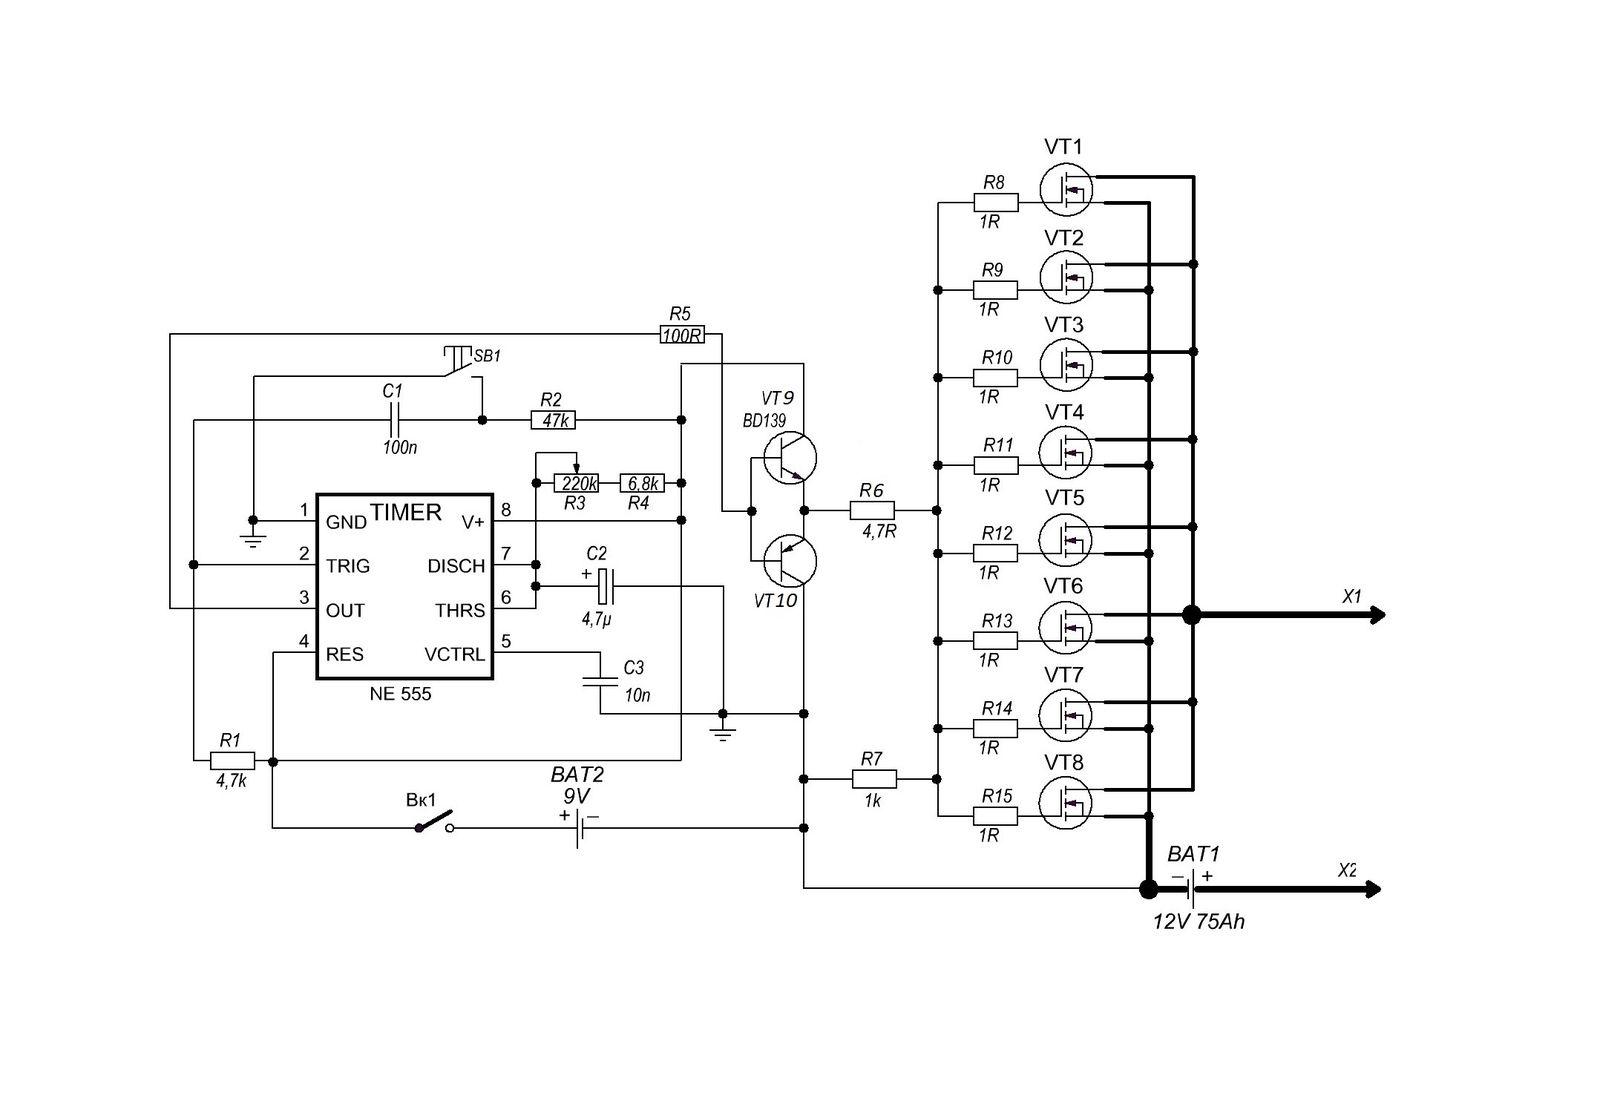 Wiring Diagram Volt Amp Meter 40w Co2 Laser